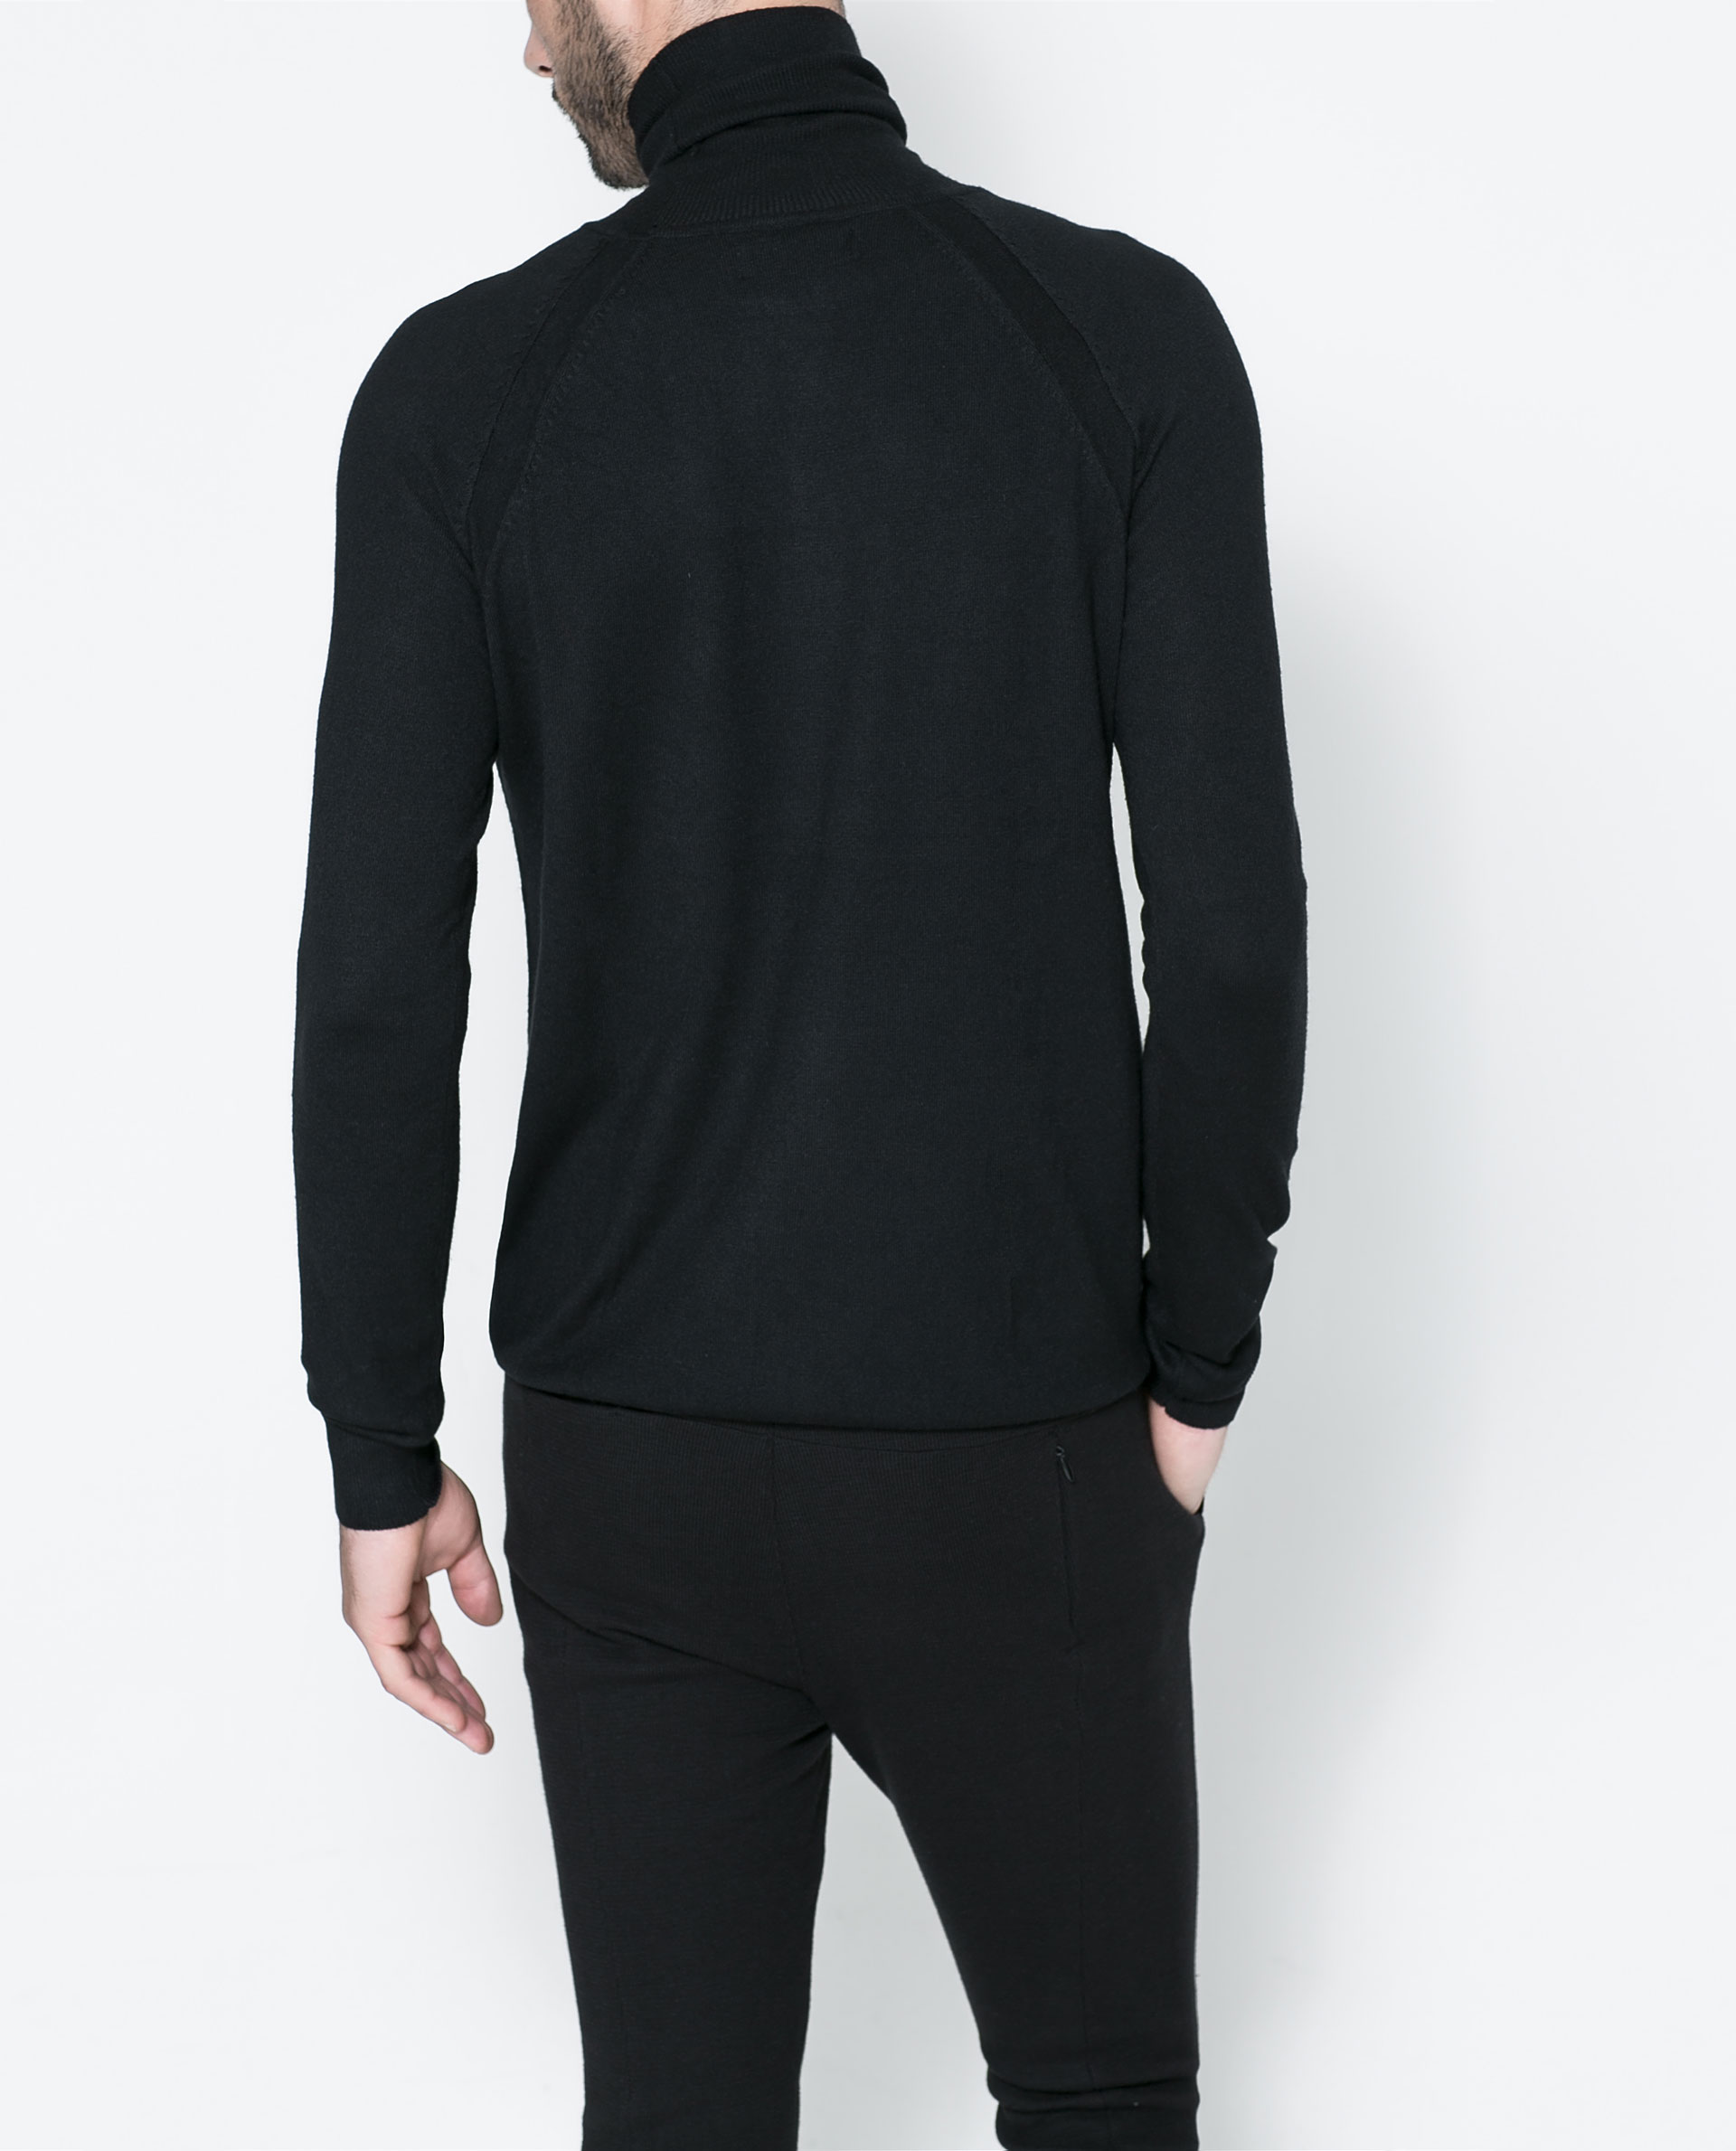 Zara Turtleneck Sweater Mens 80